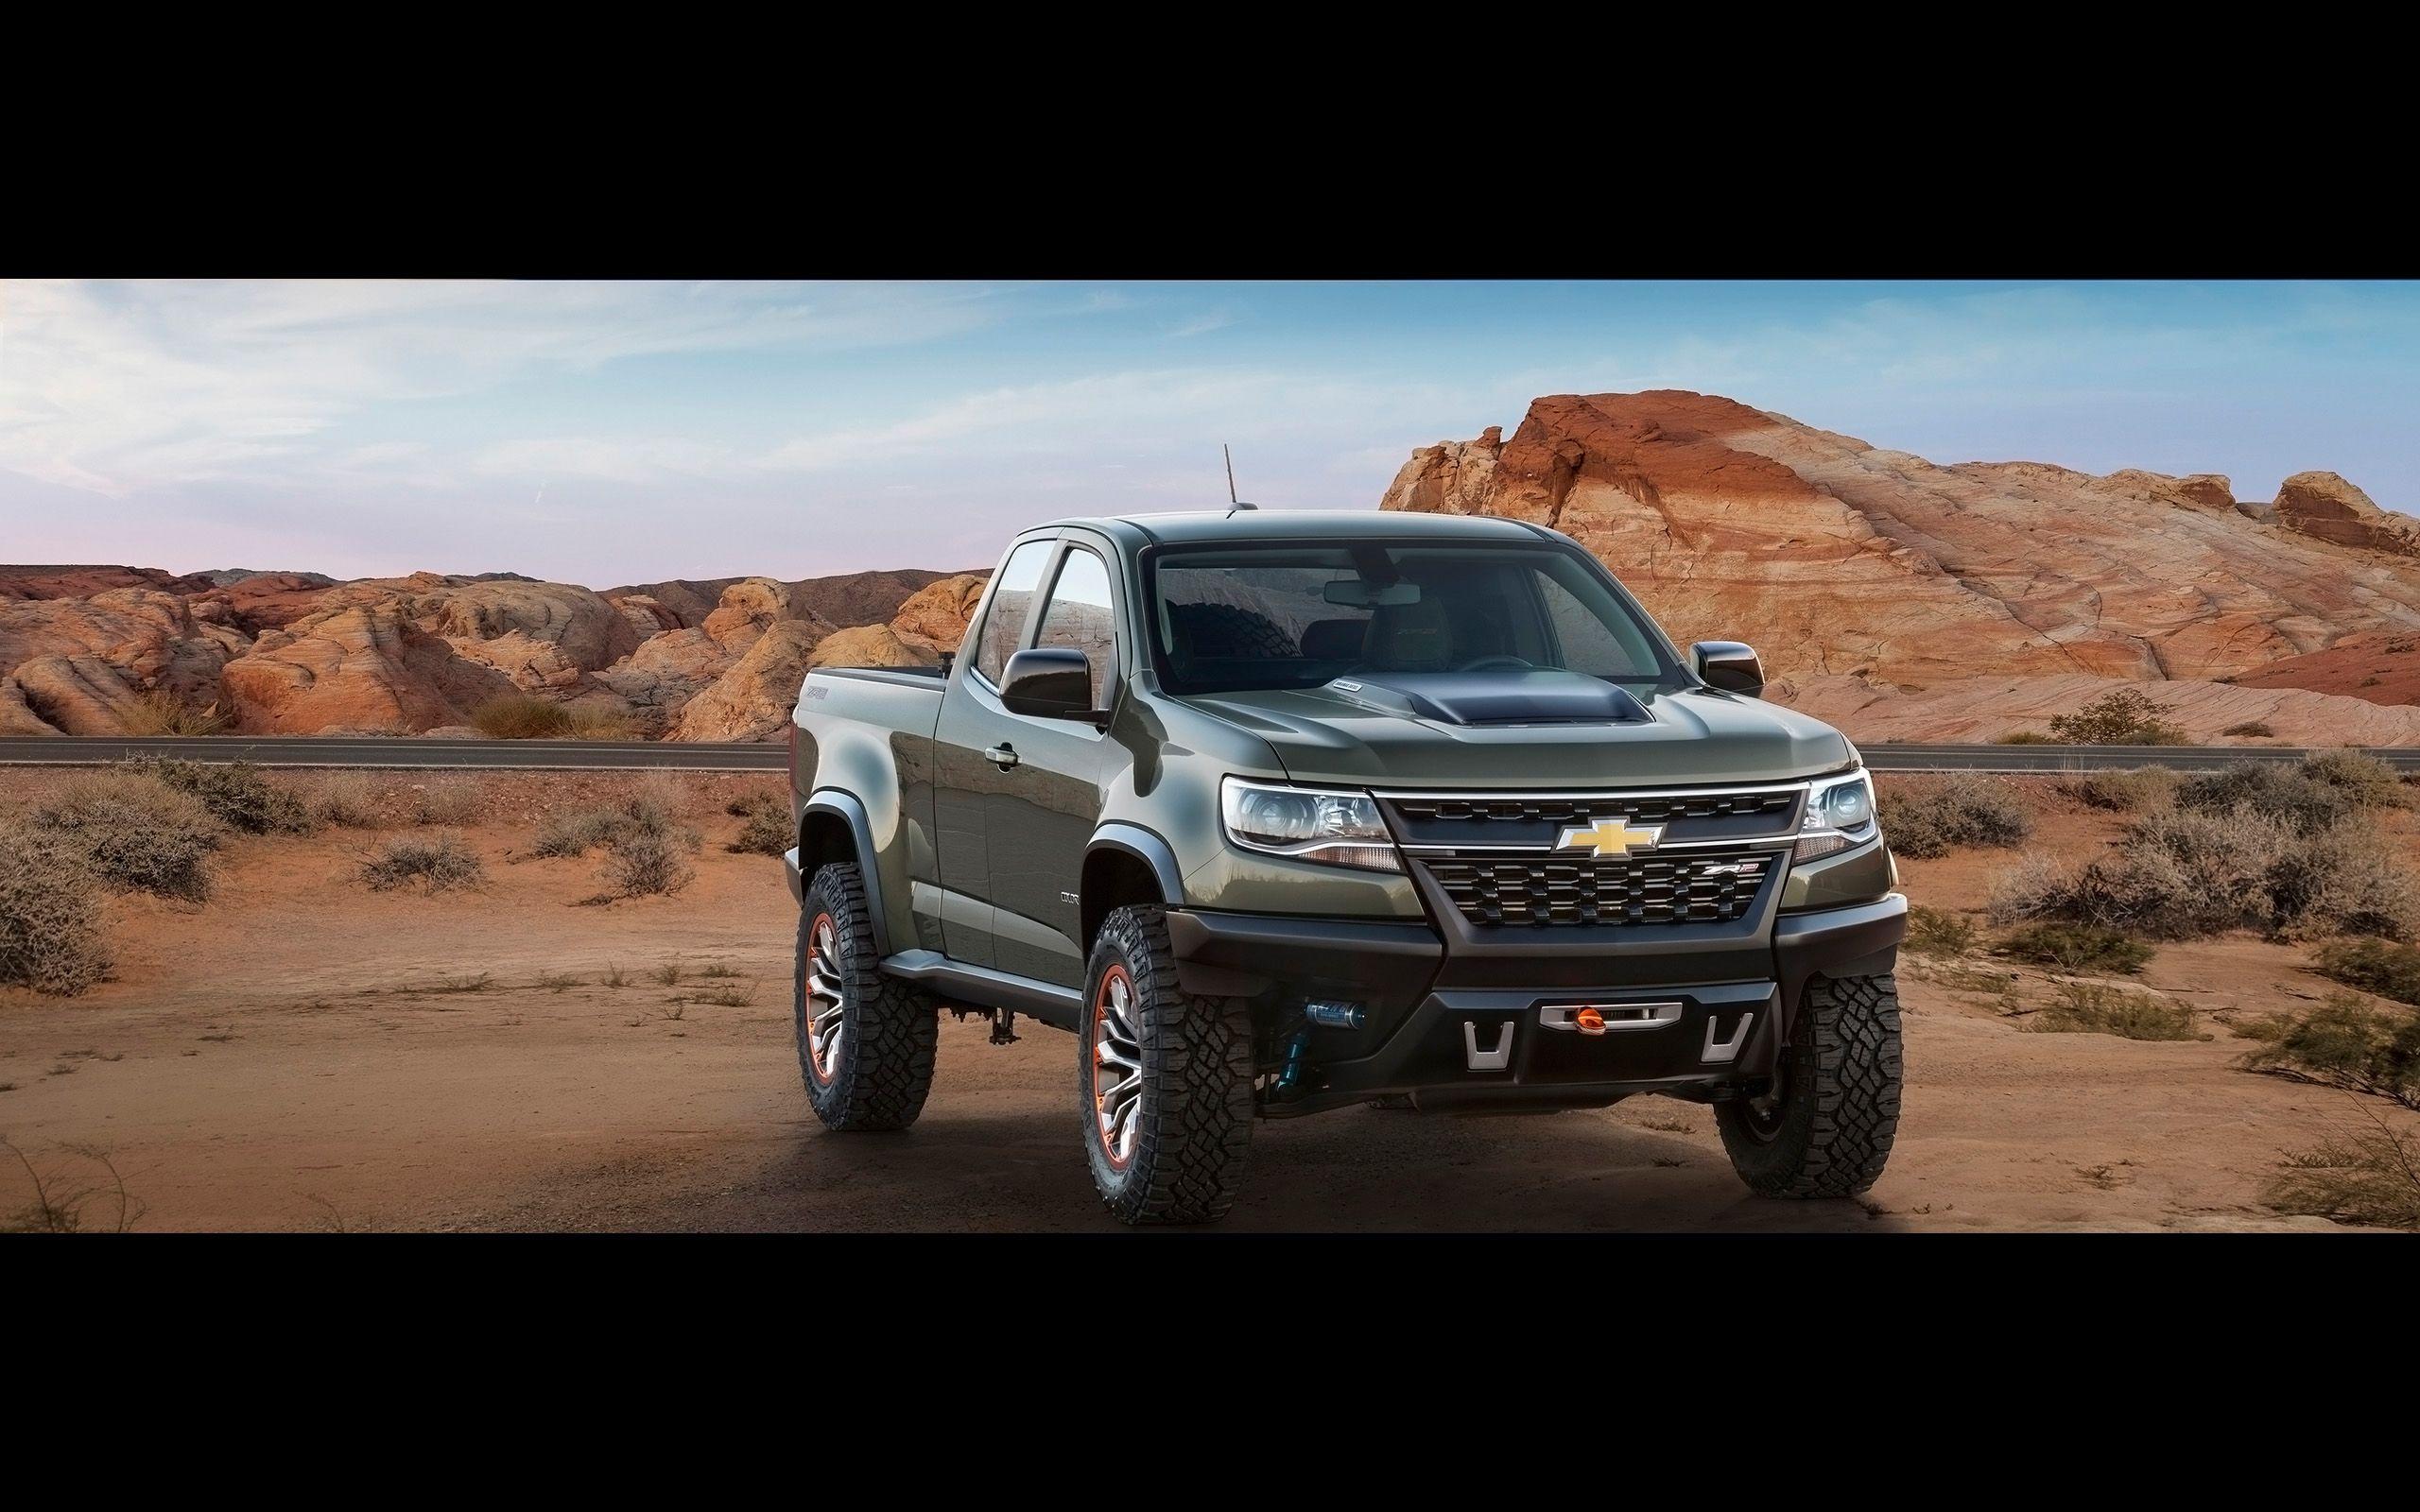 2014 Chevrolet Colorado ZR2 concept truck